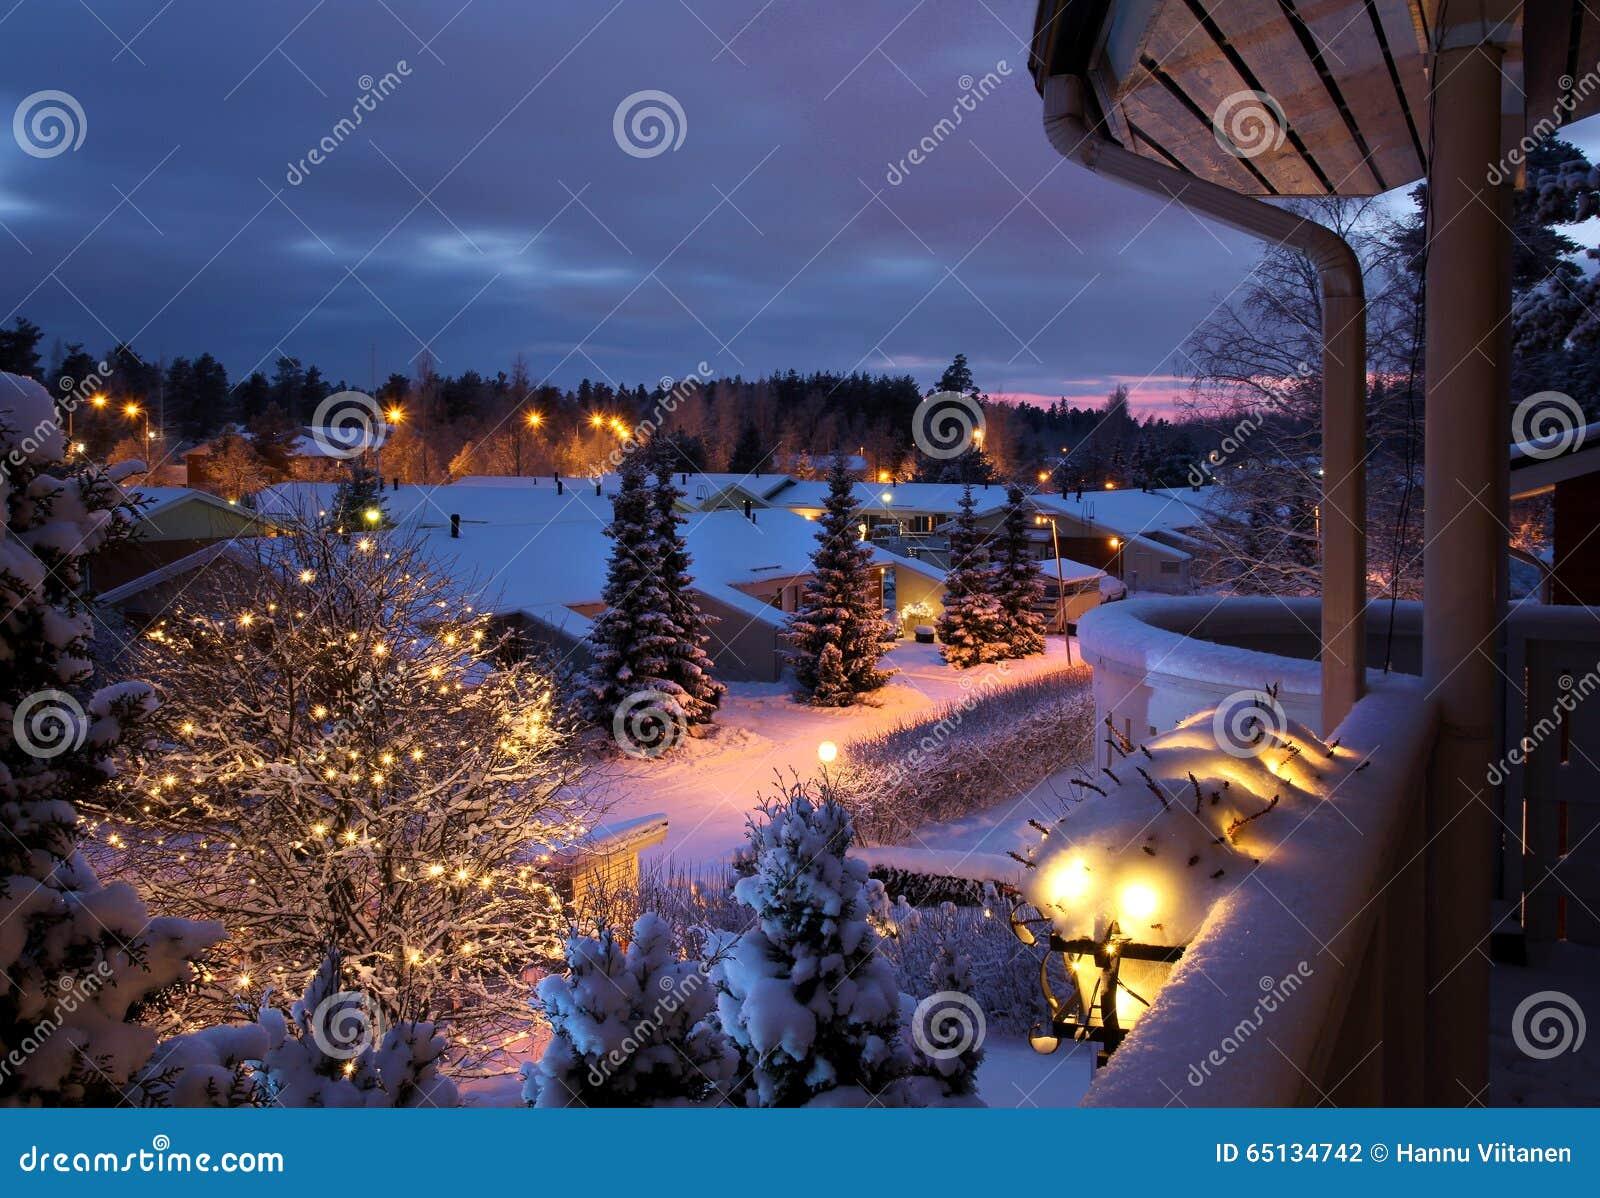 winter street snowy christmas scenery stock photo image of night